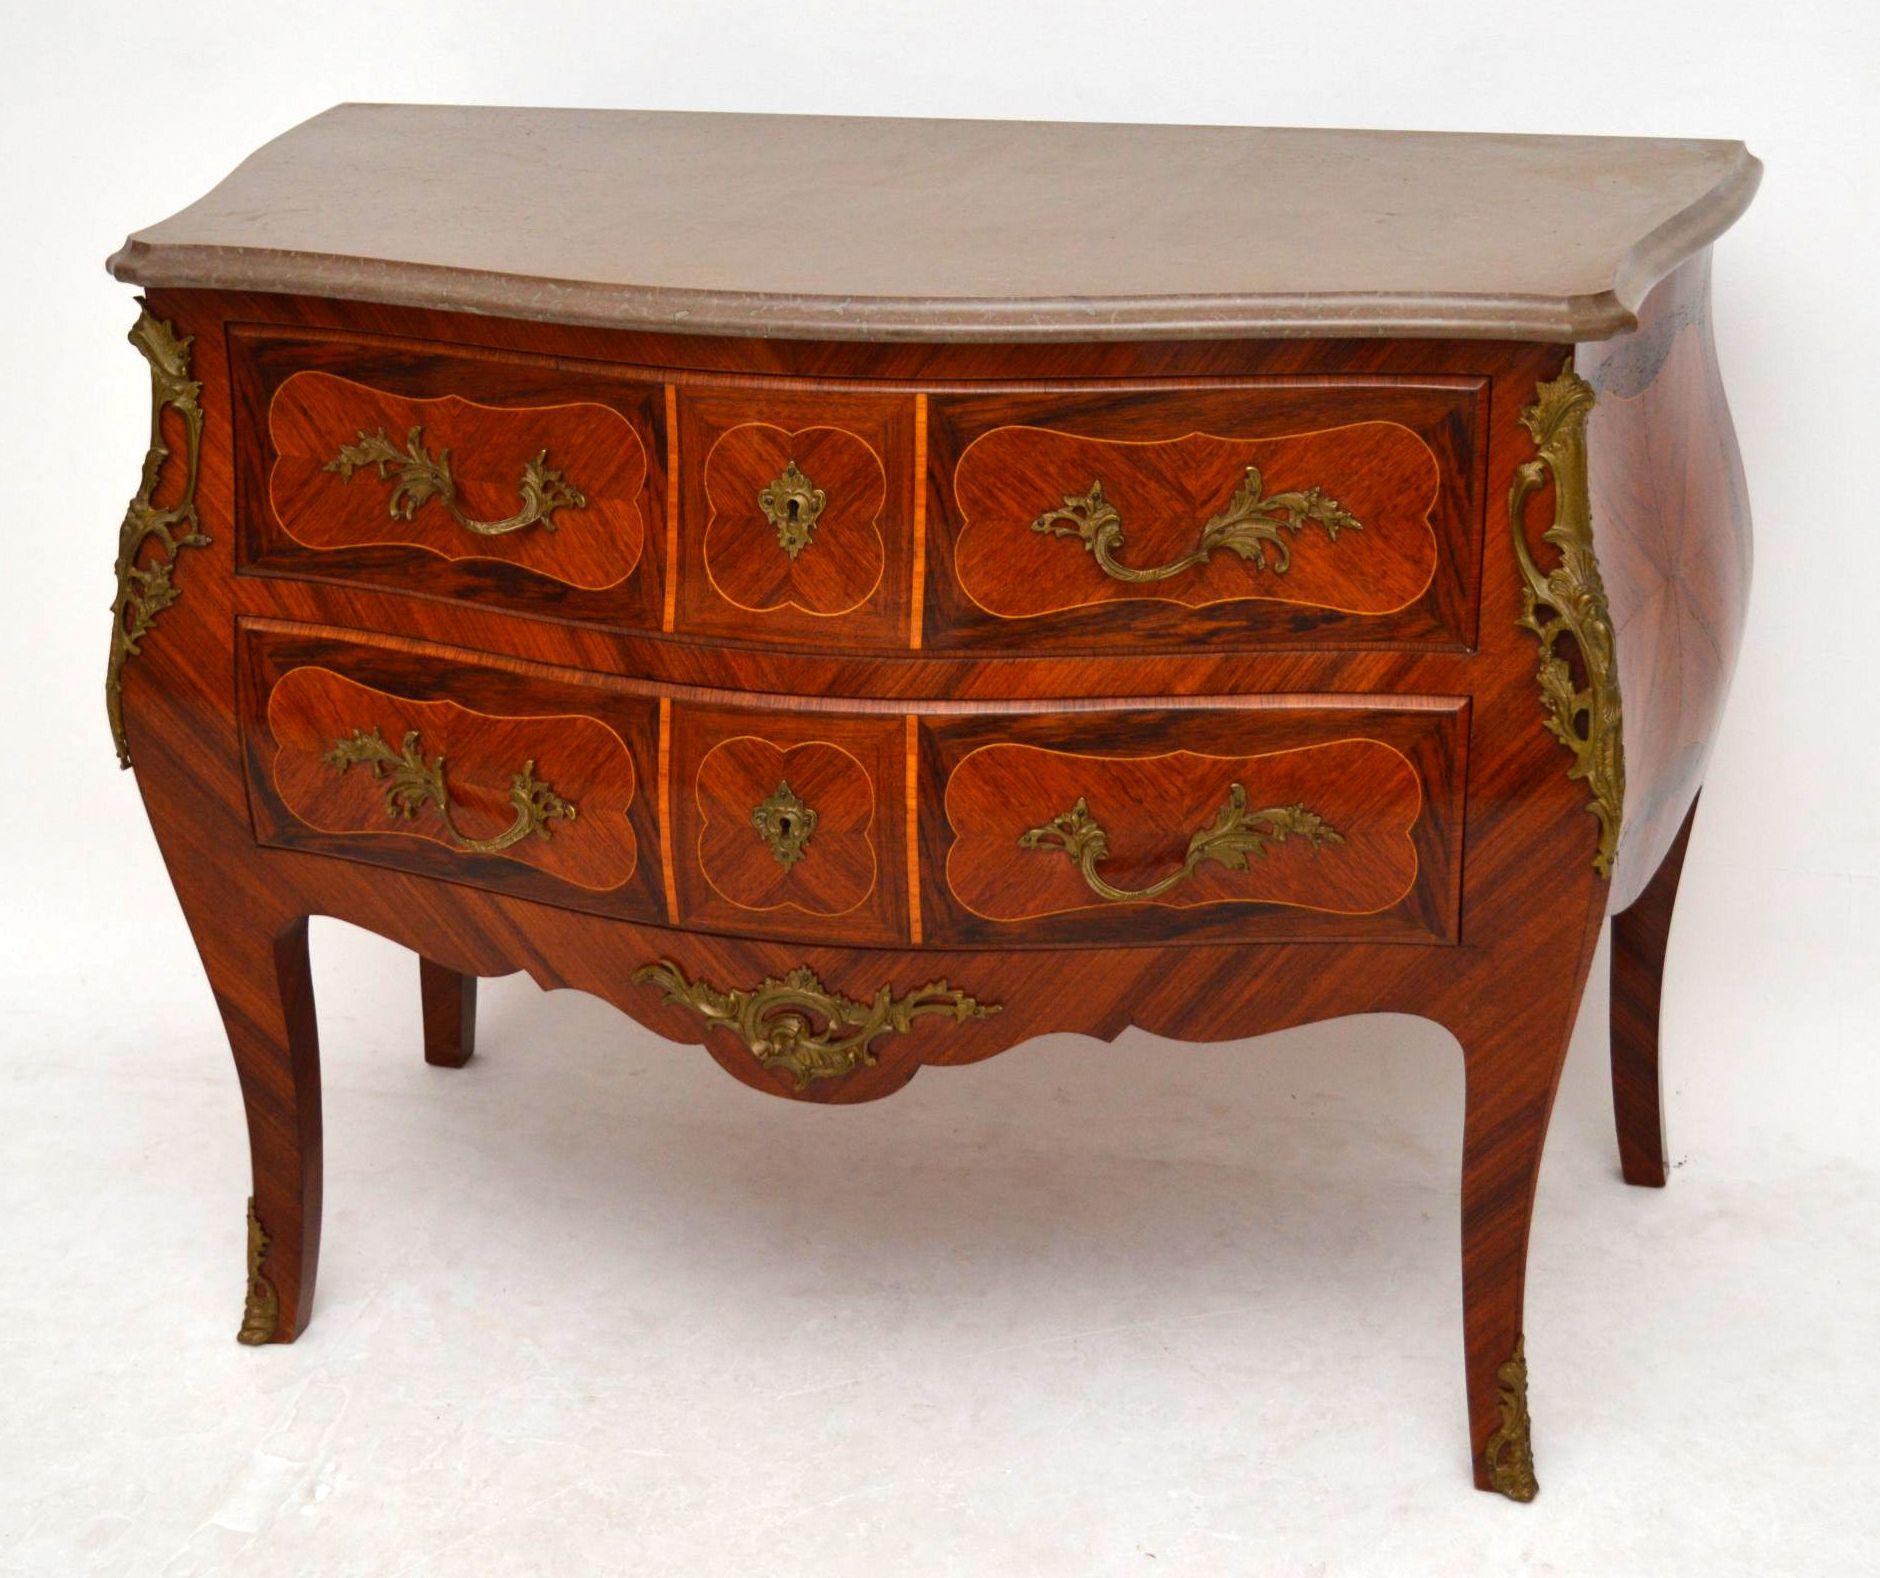 antike schwedische kommode mit marmor oberfl che. Black Bedroom Furniture Sets. Home Design Ideas